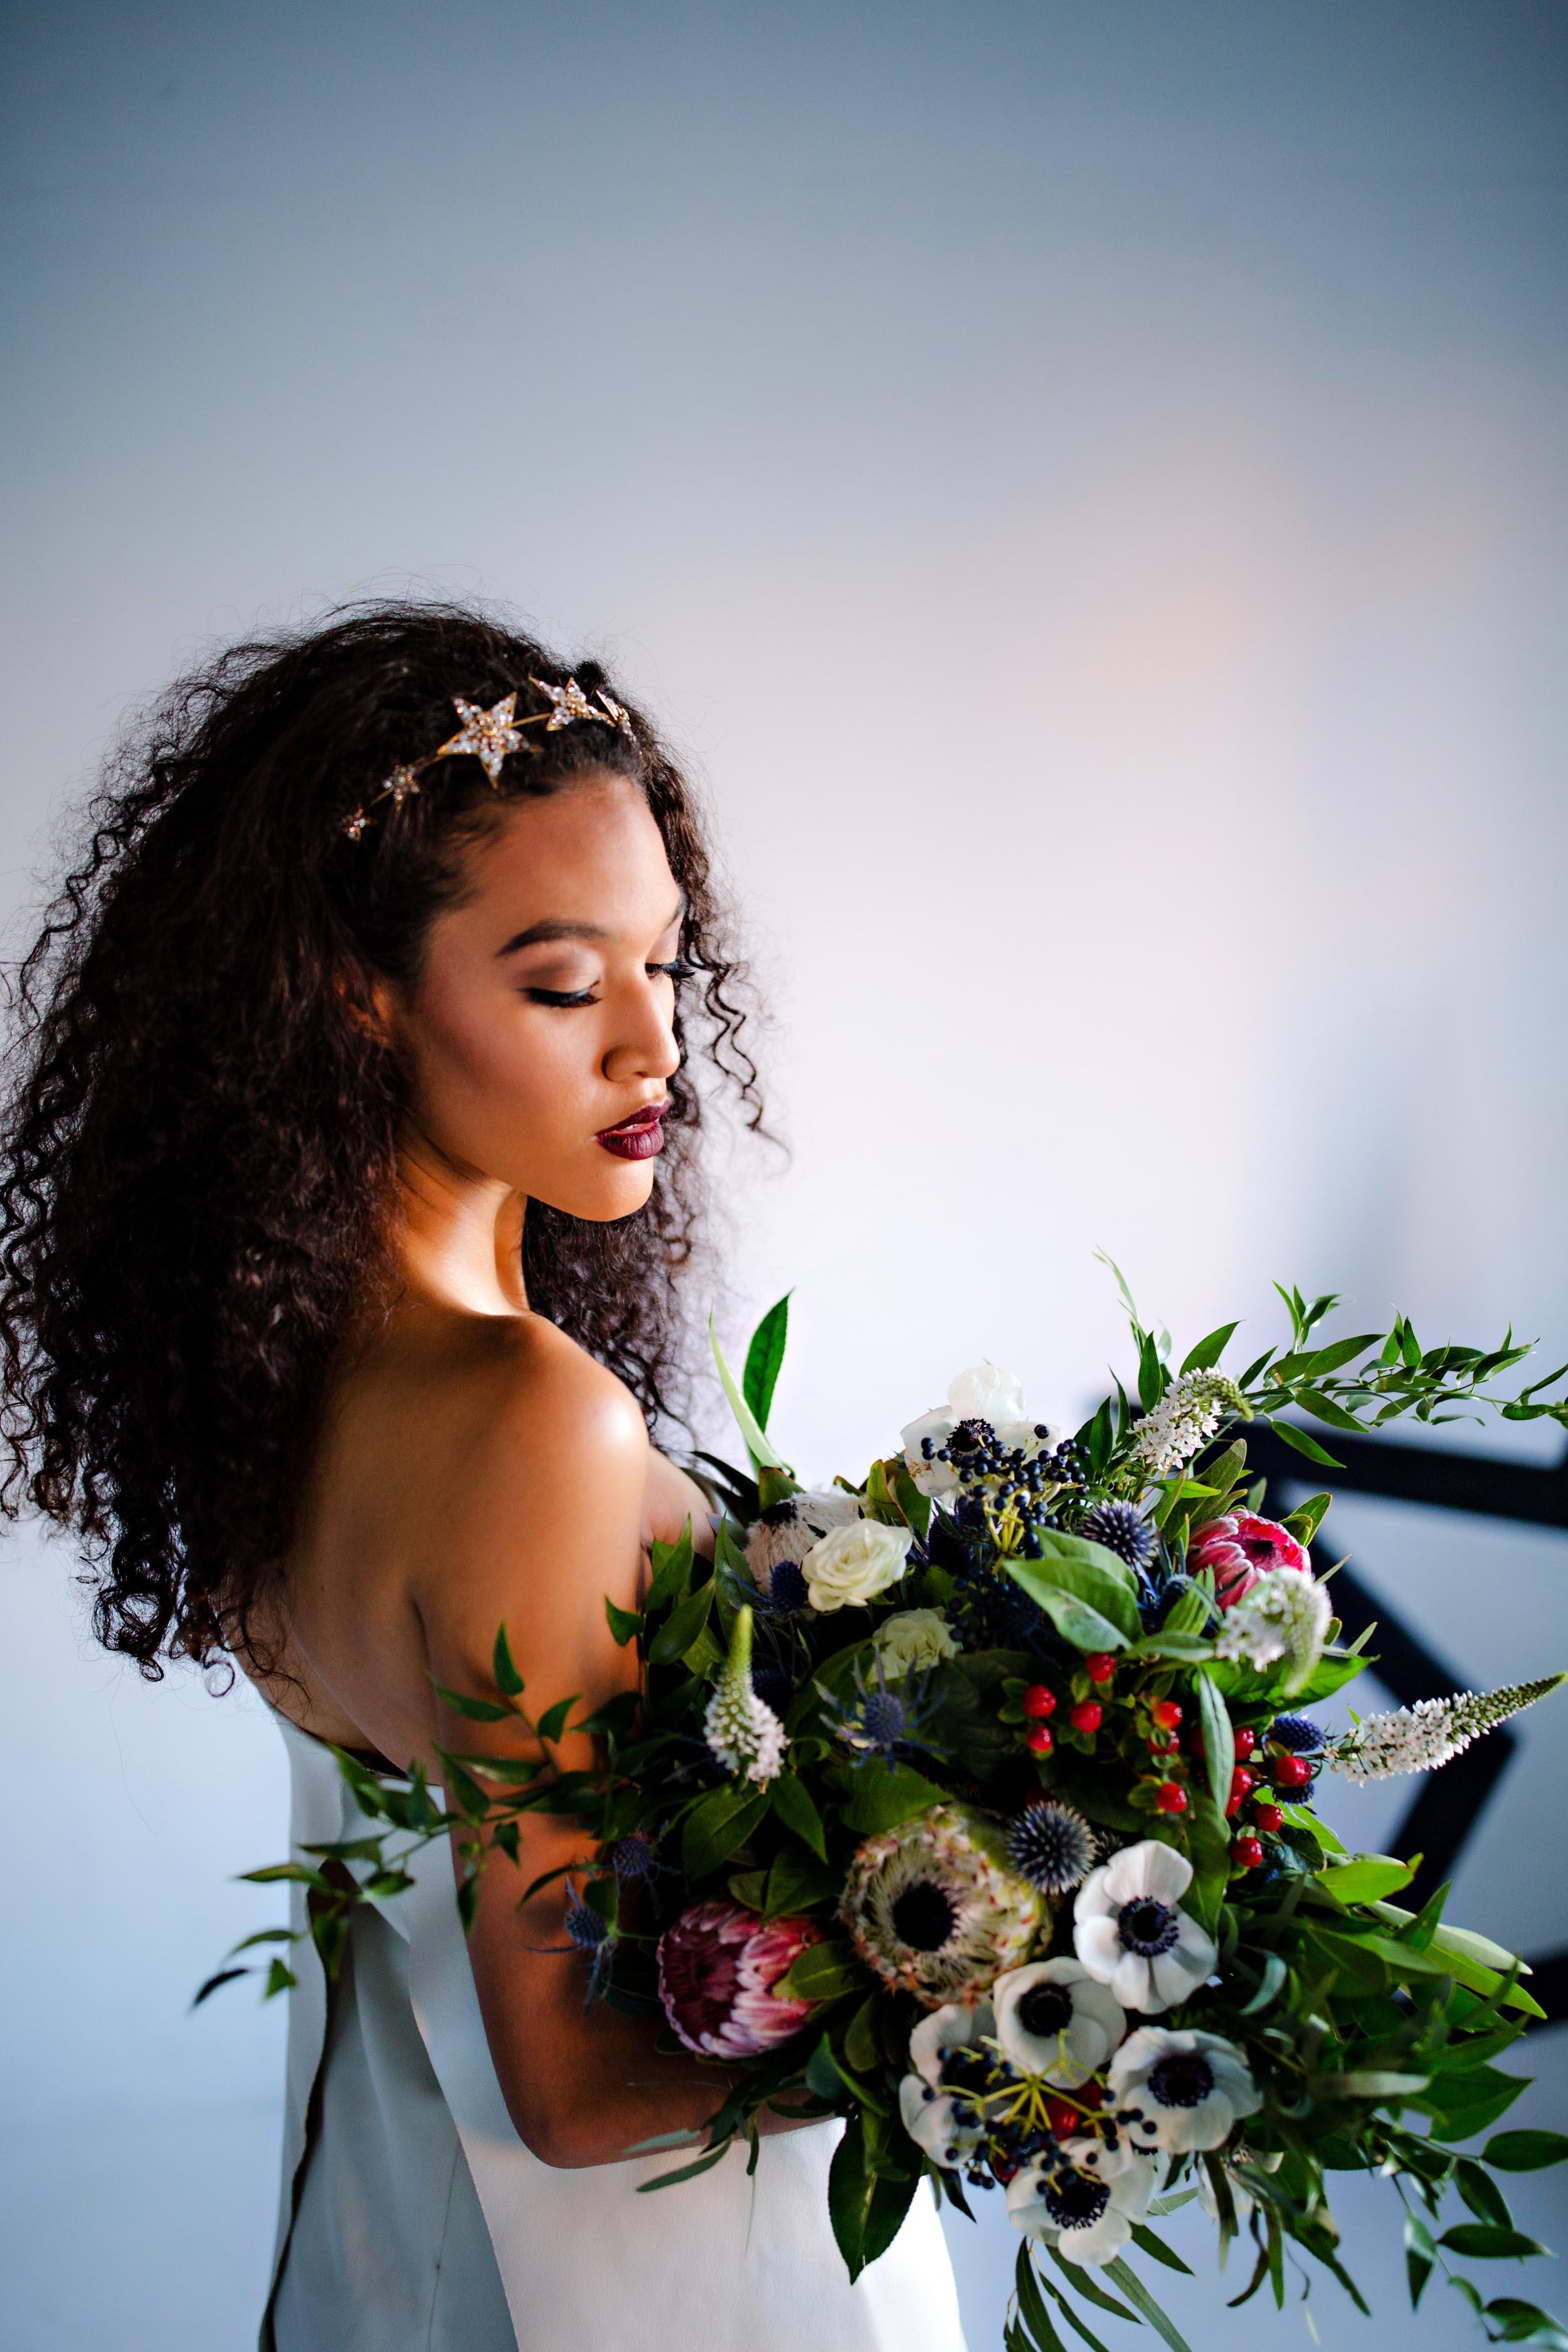 weddings-starsstripes-31.jpg